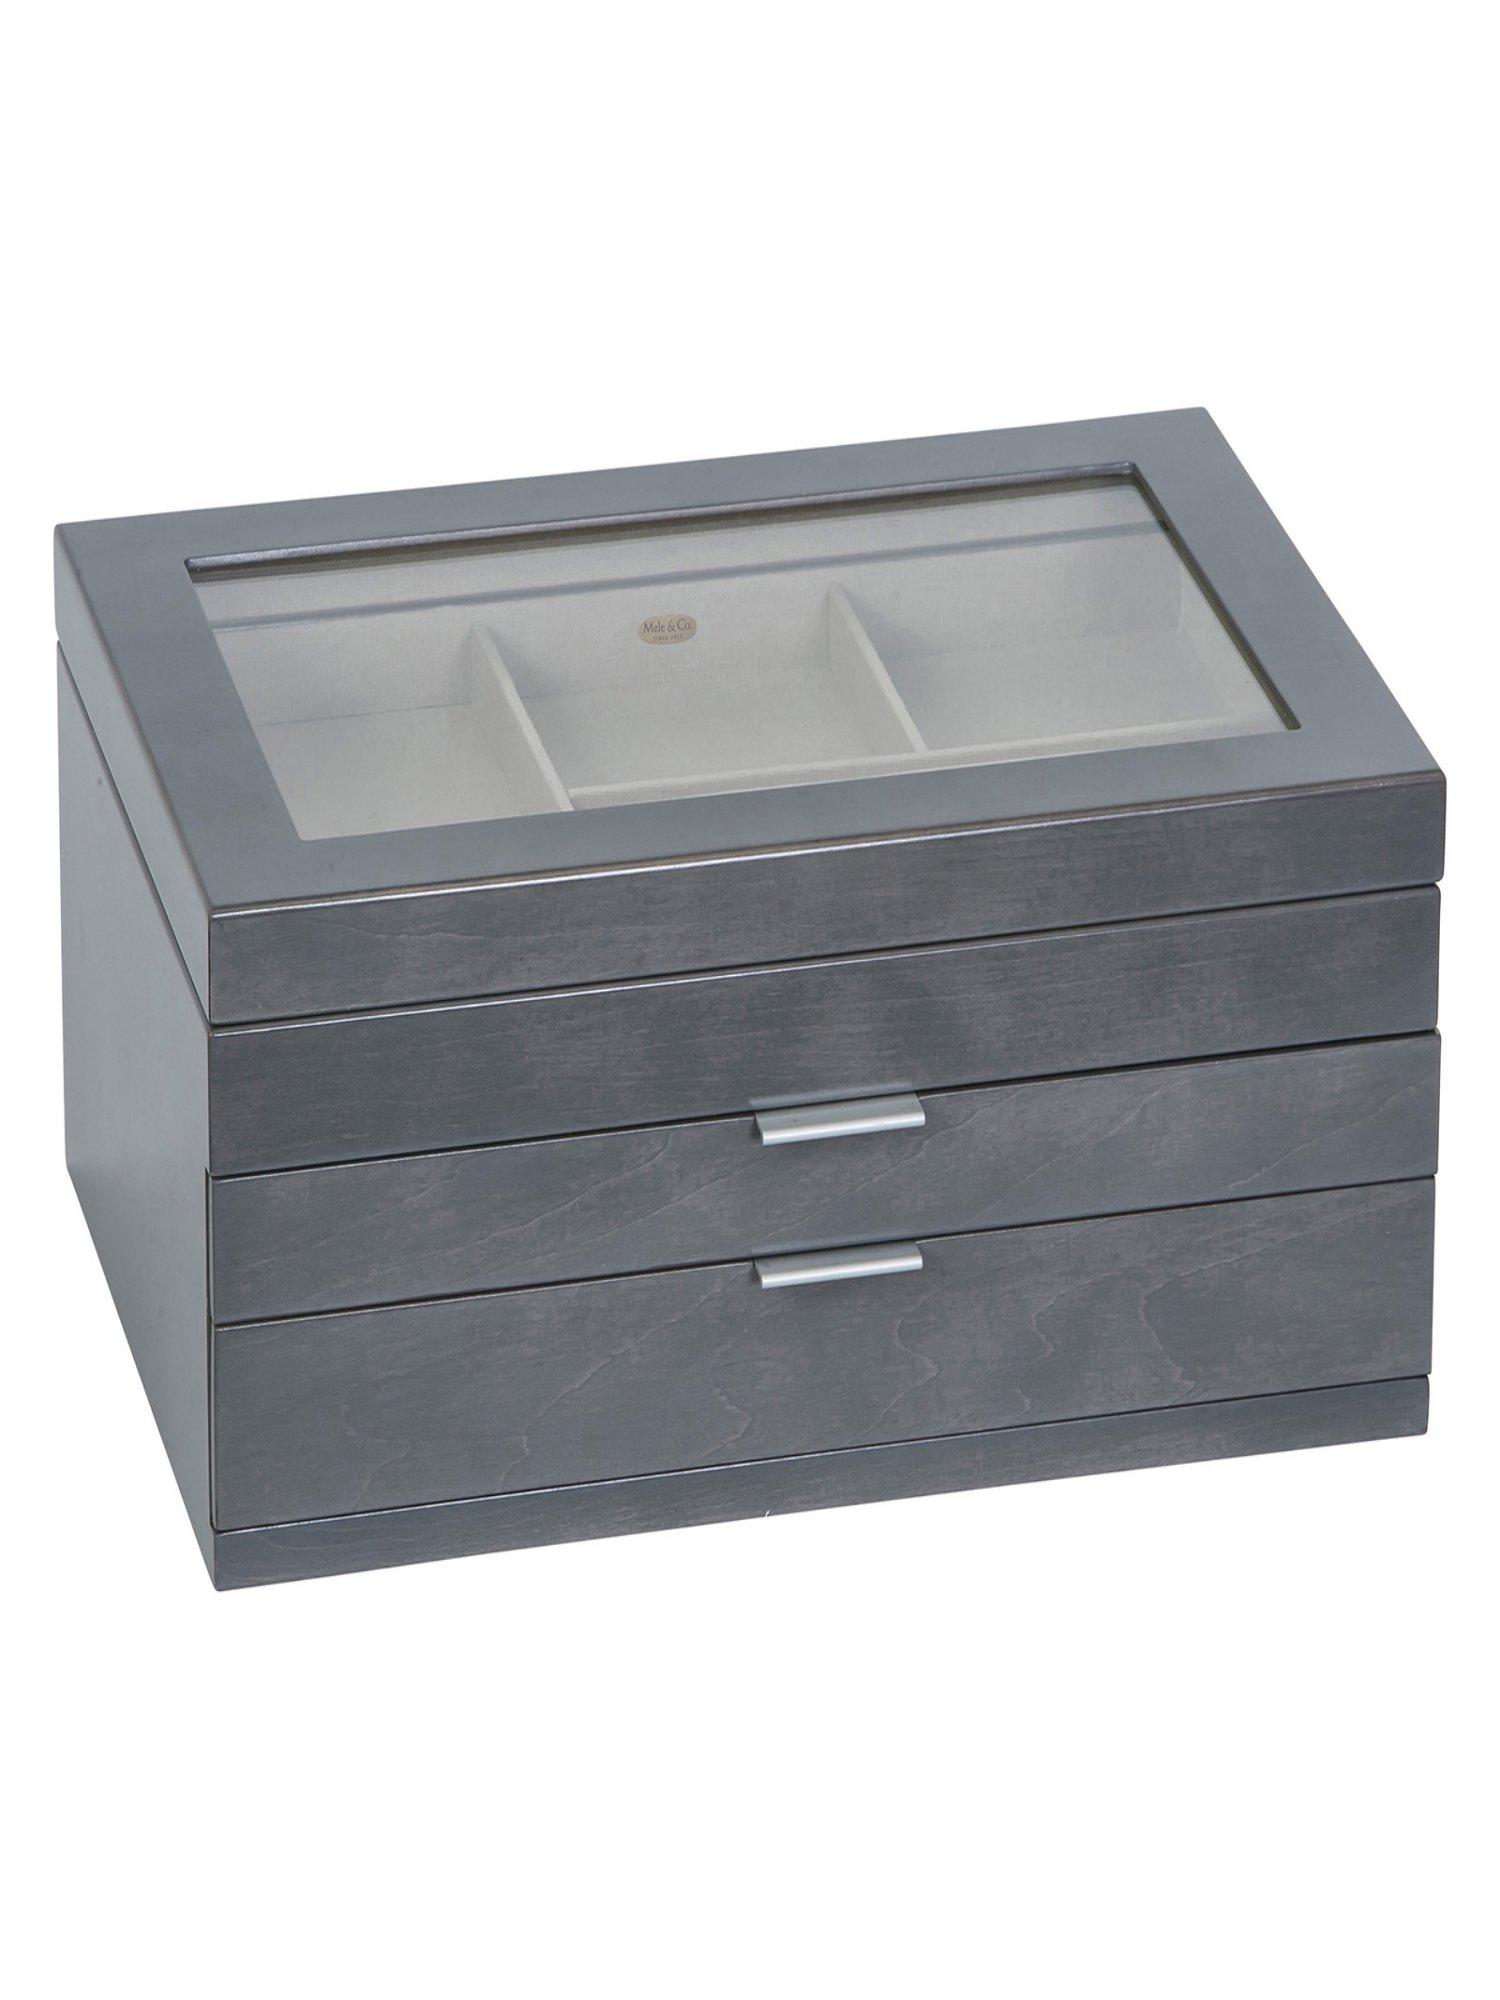 Misty Glass Top Wooden Jewelry Box - 15L x 10W in.